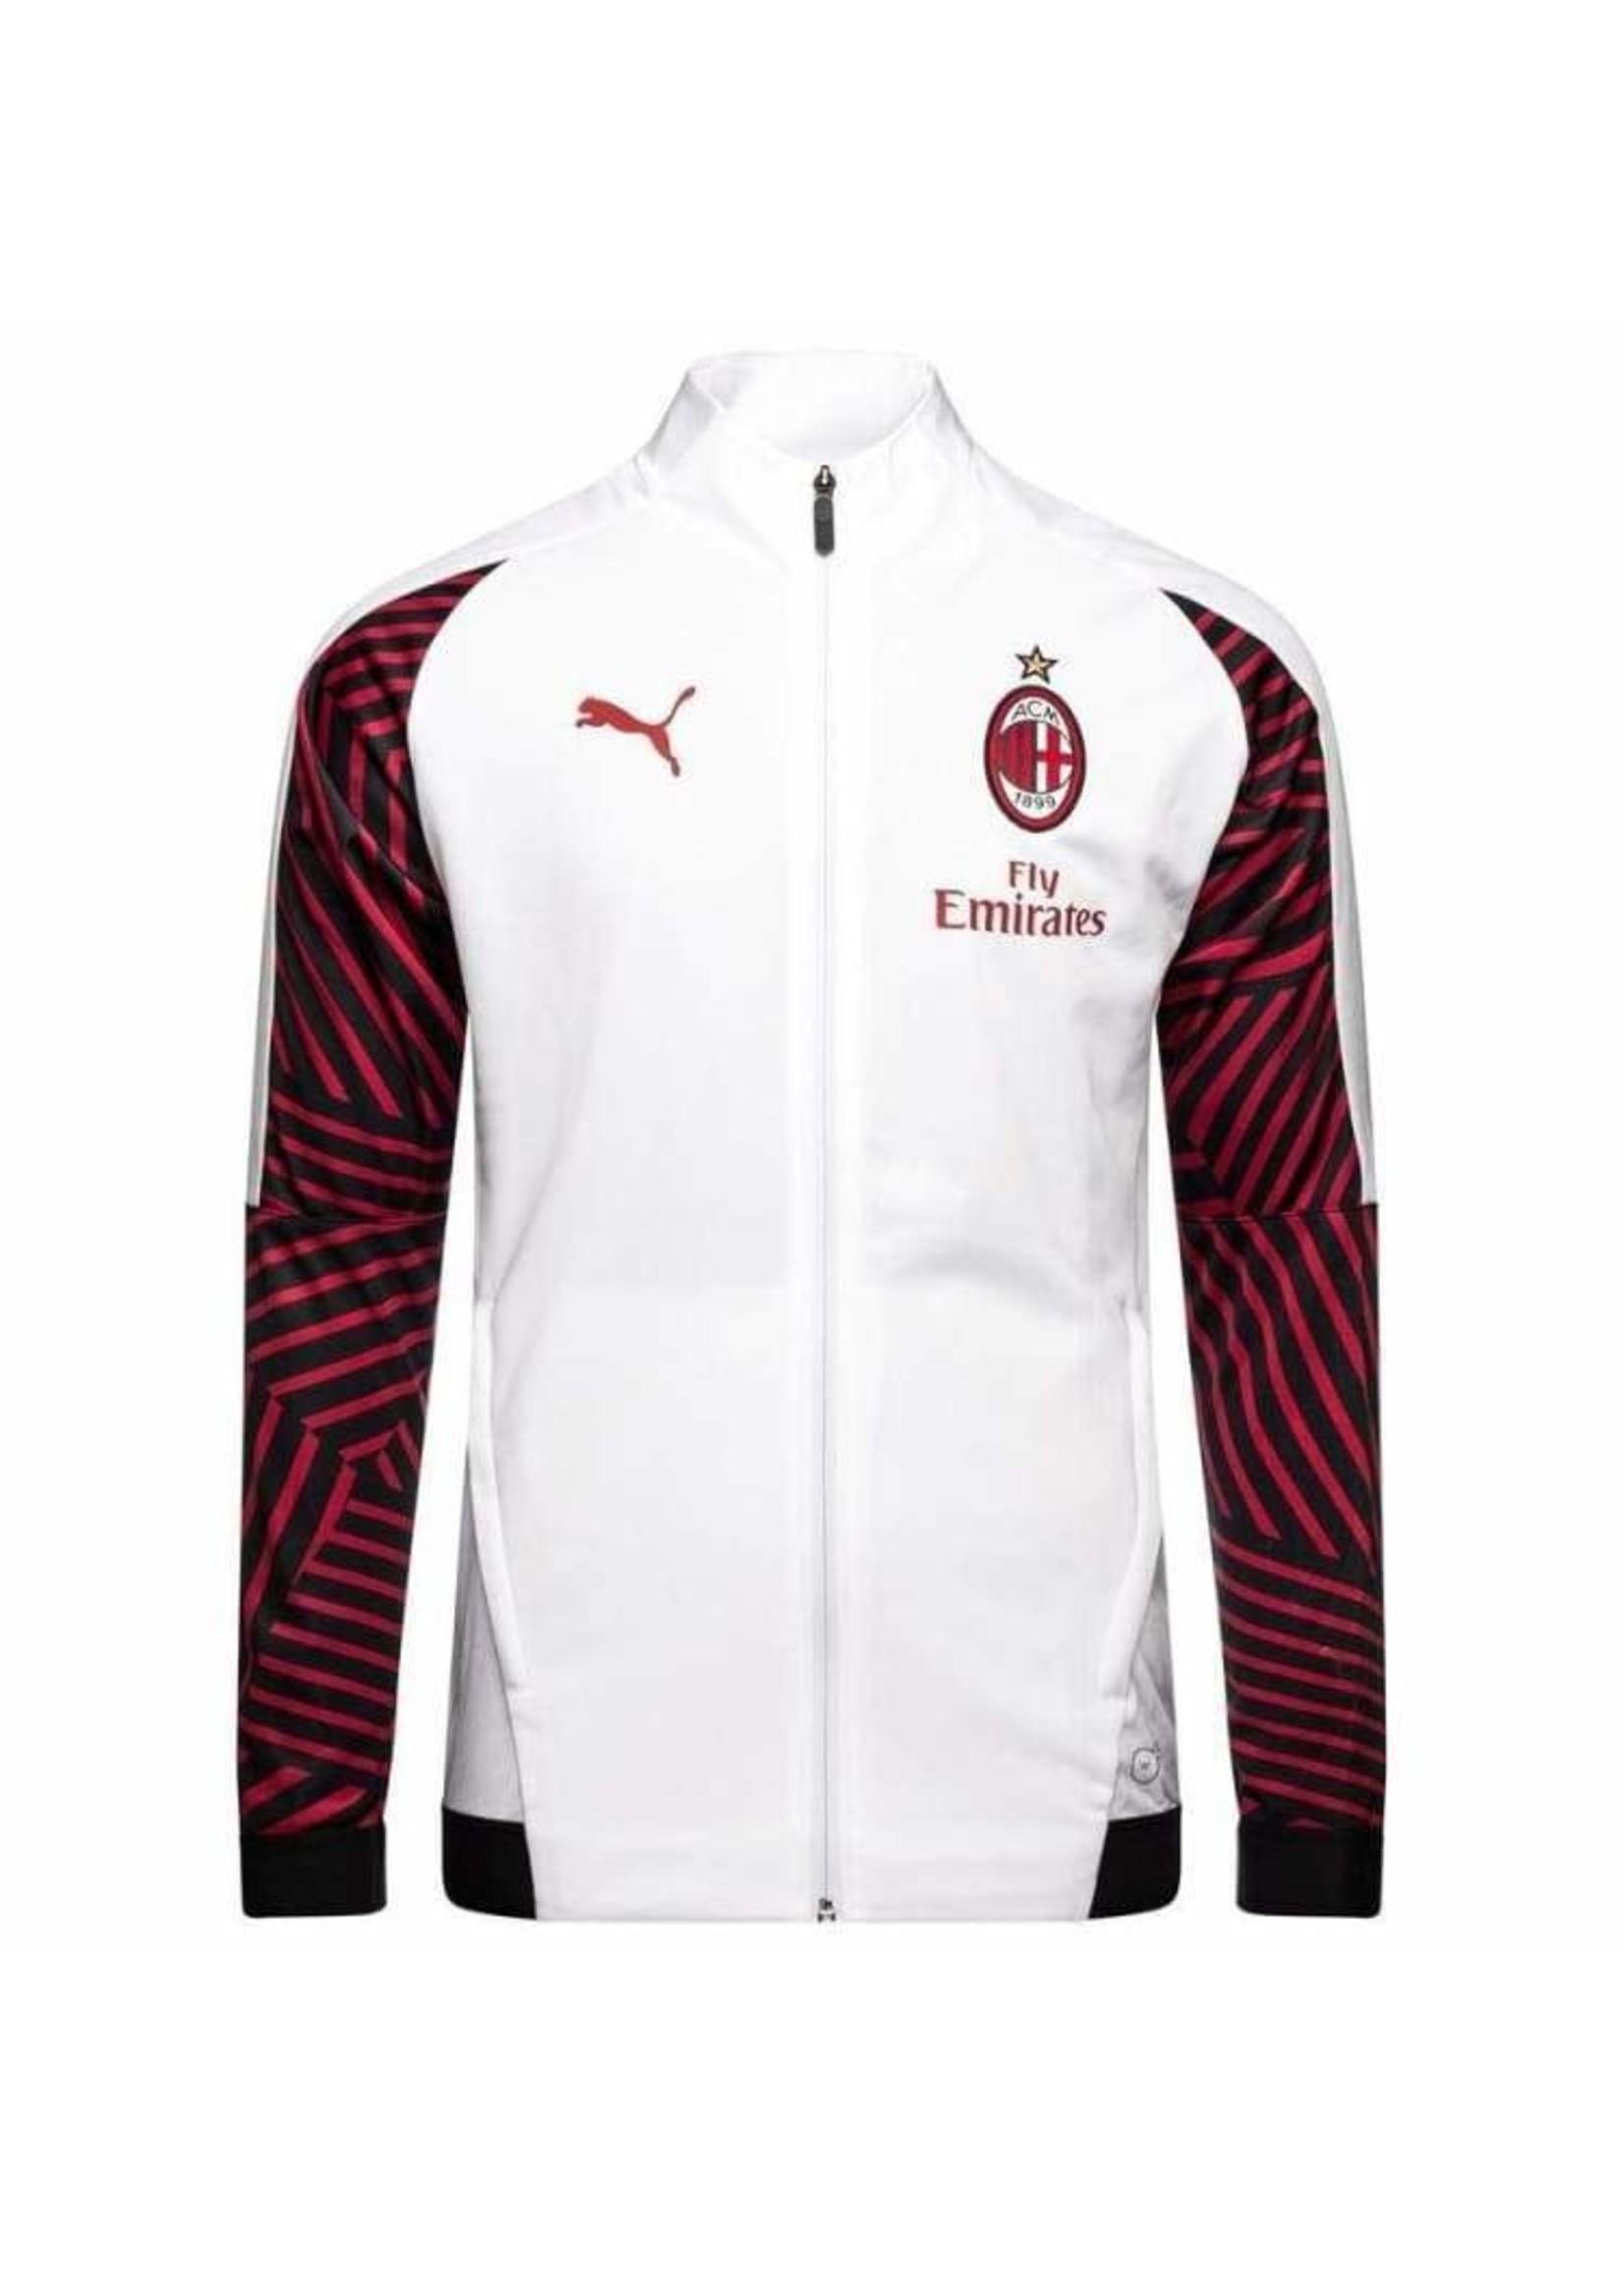 Puma AC Milan Stadium Track Jacket - 19/20 Home